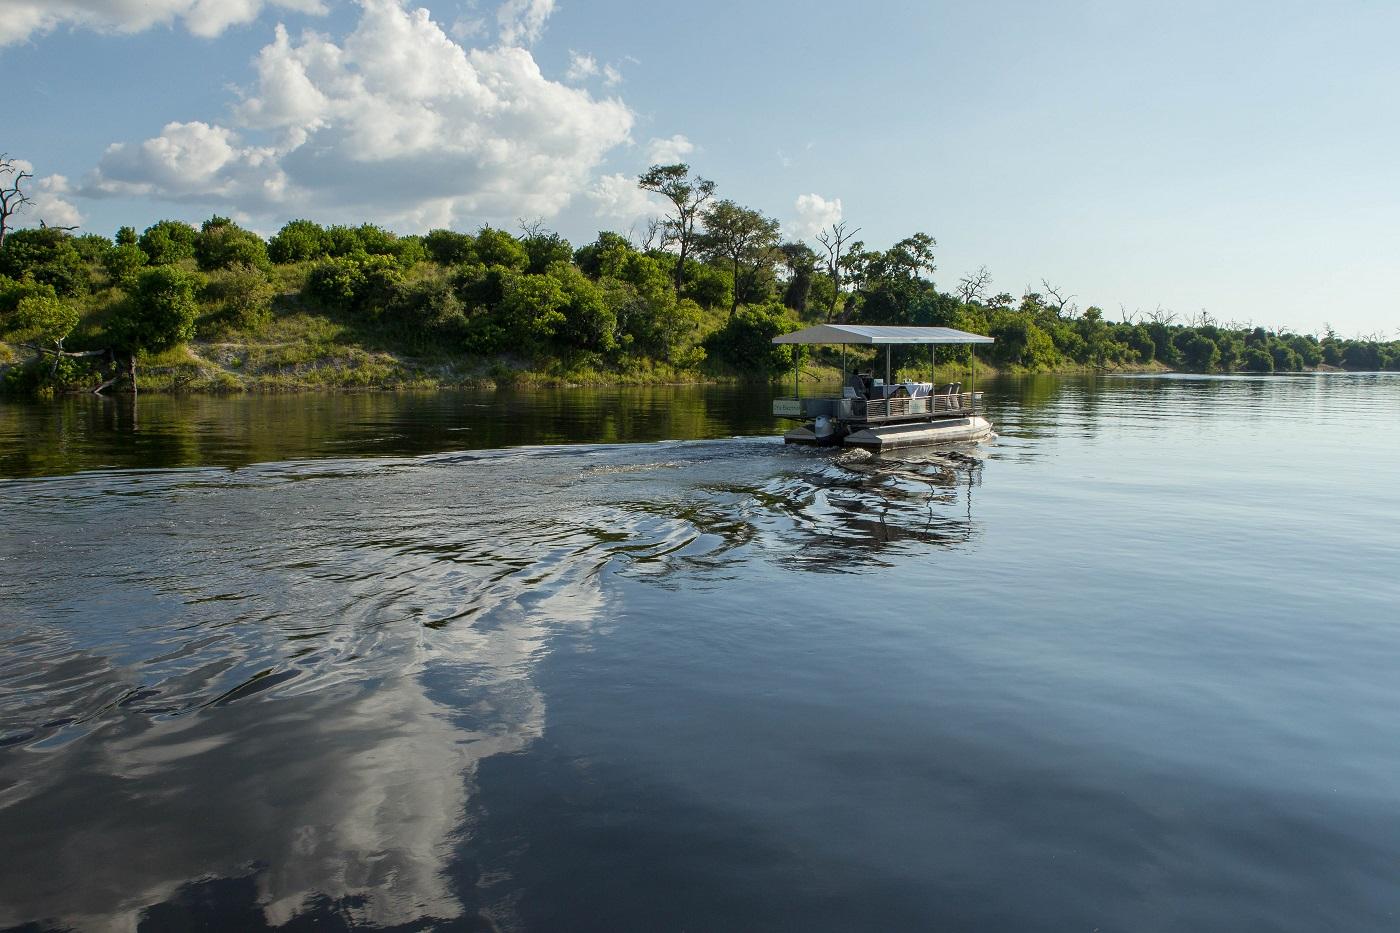 Cruise down the Chobe River